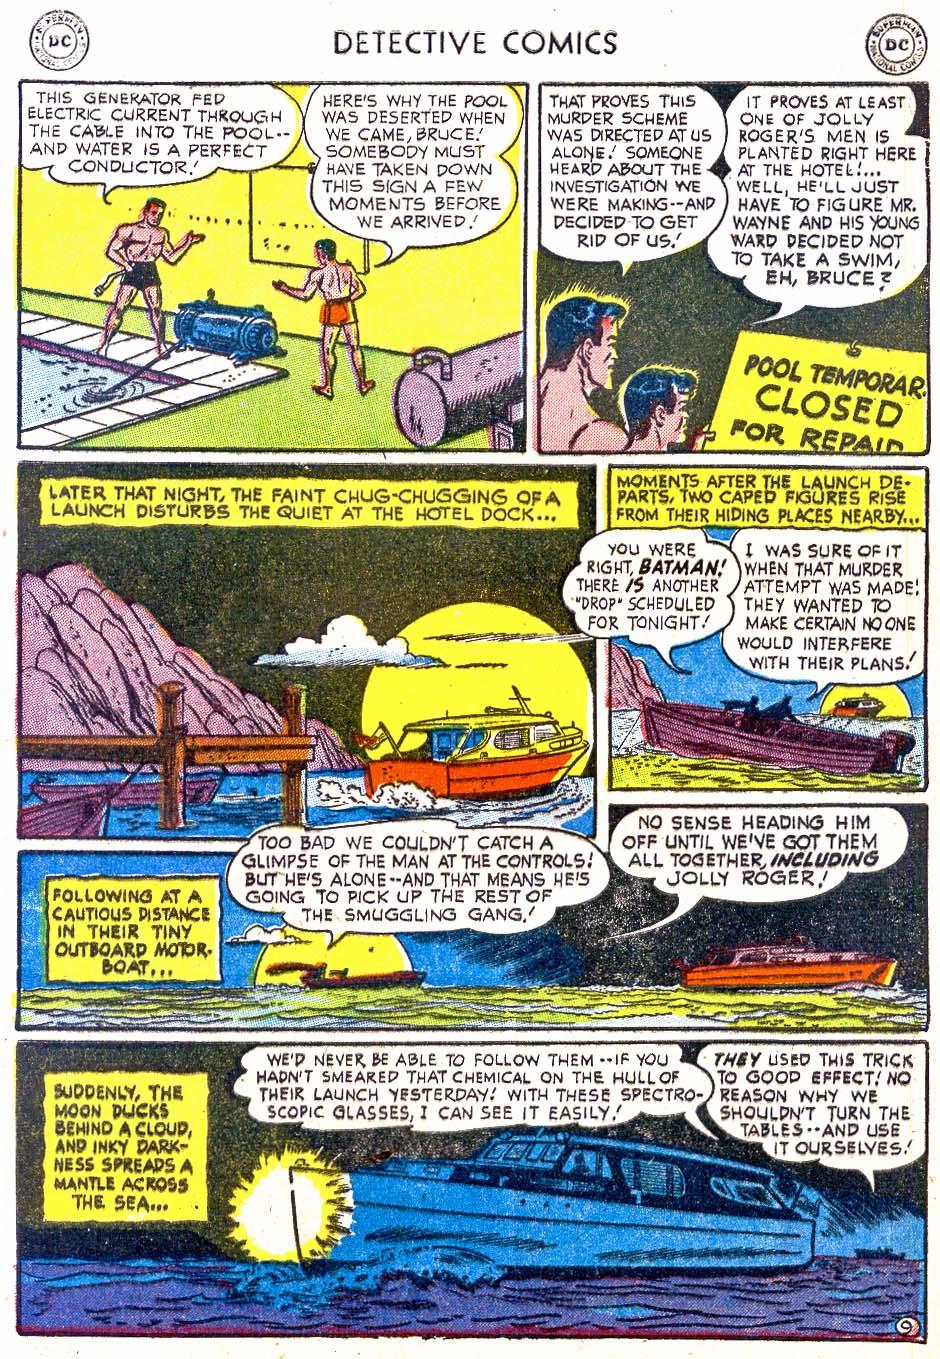 Detective Comics (1937) 202 Page 10